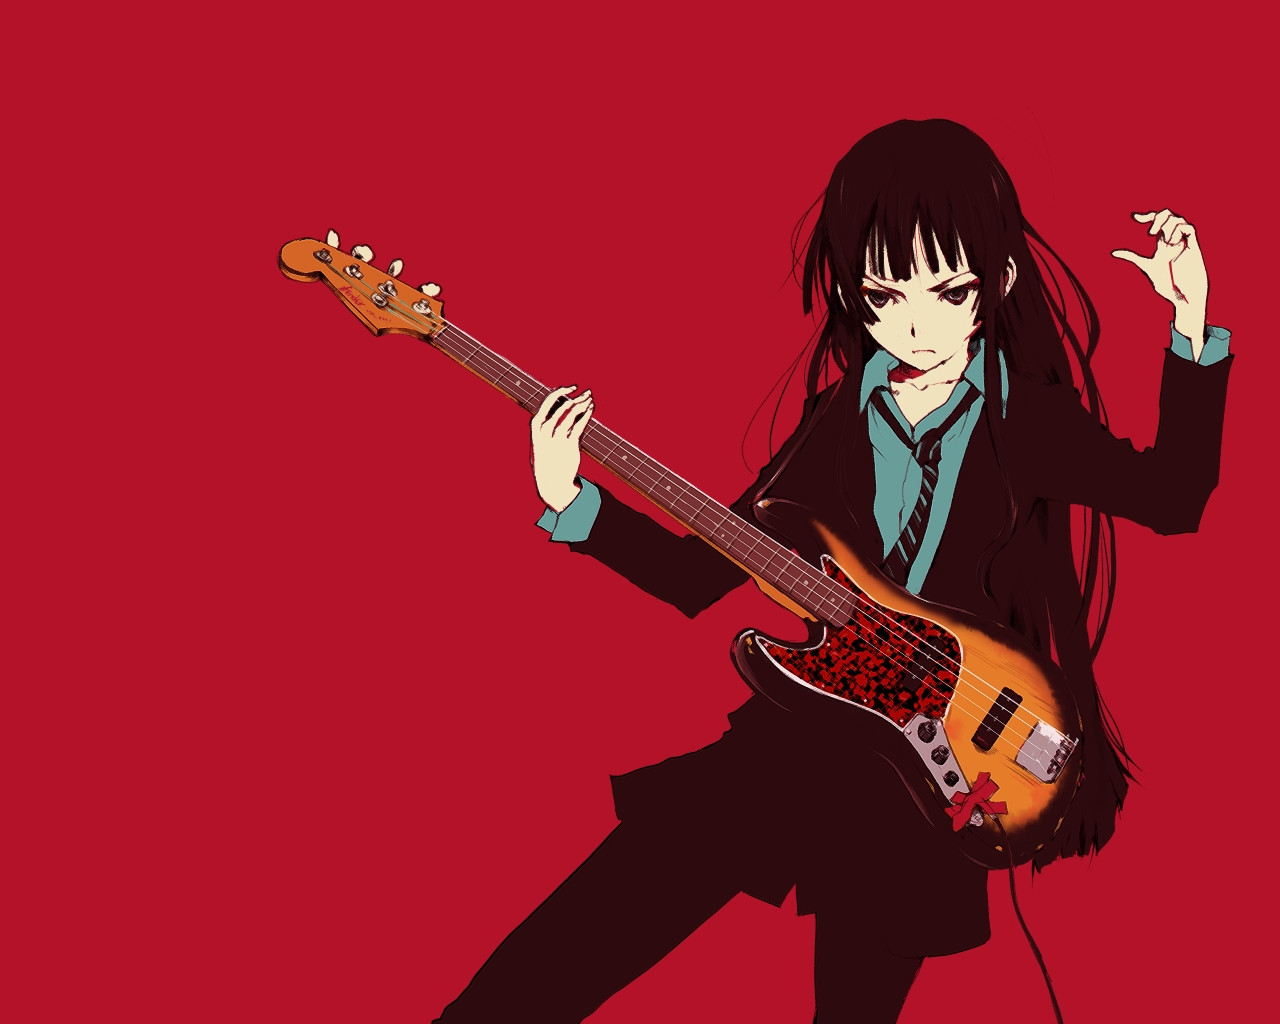 akiyama_mio guitar instrument k-on! red